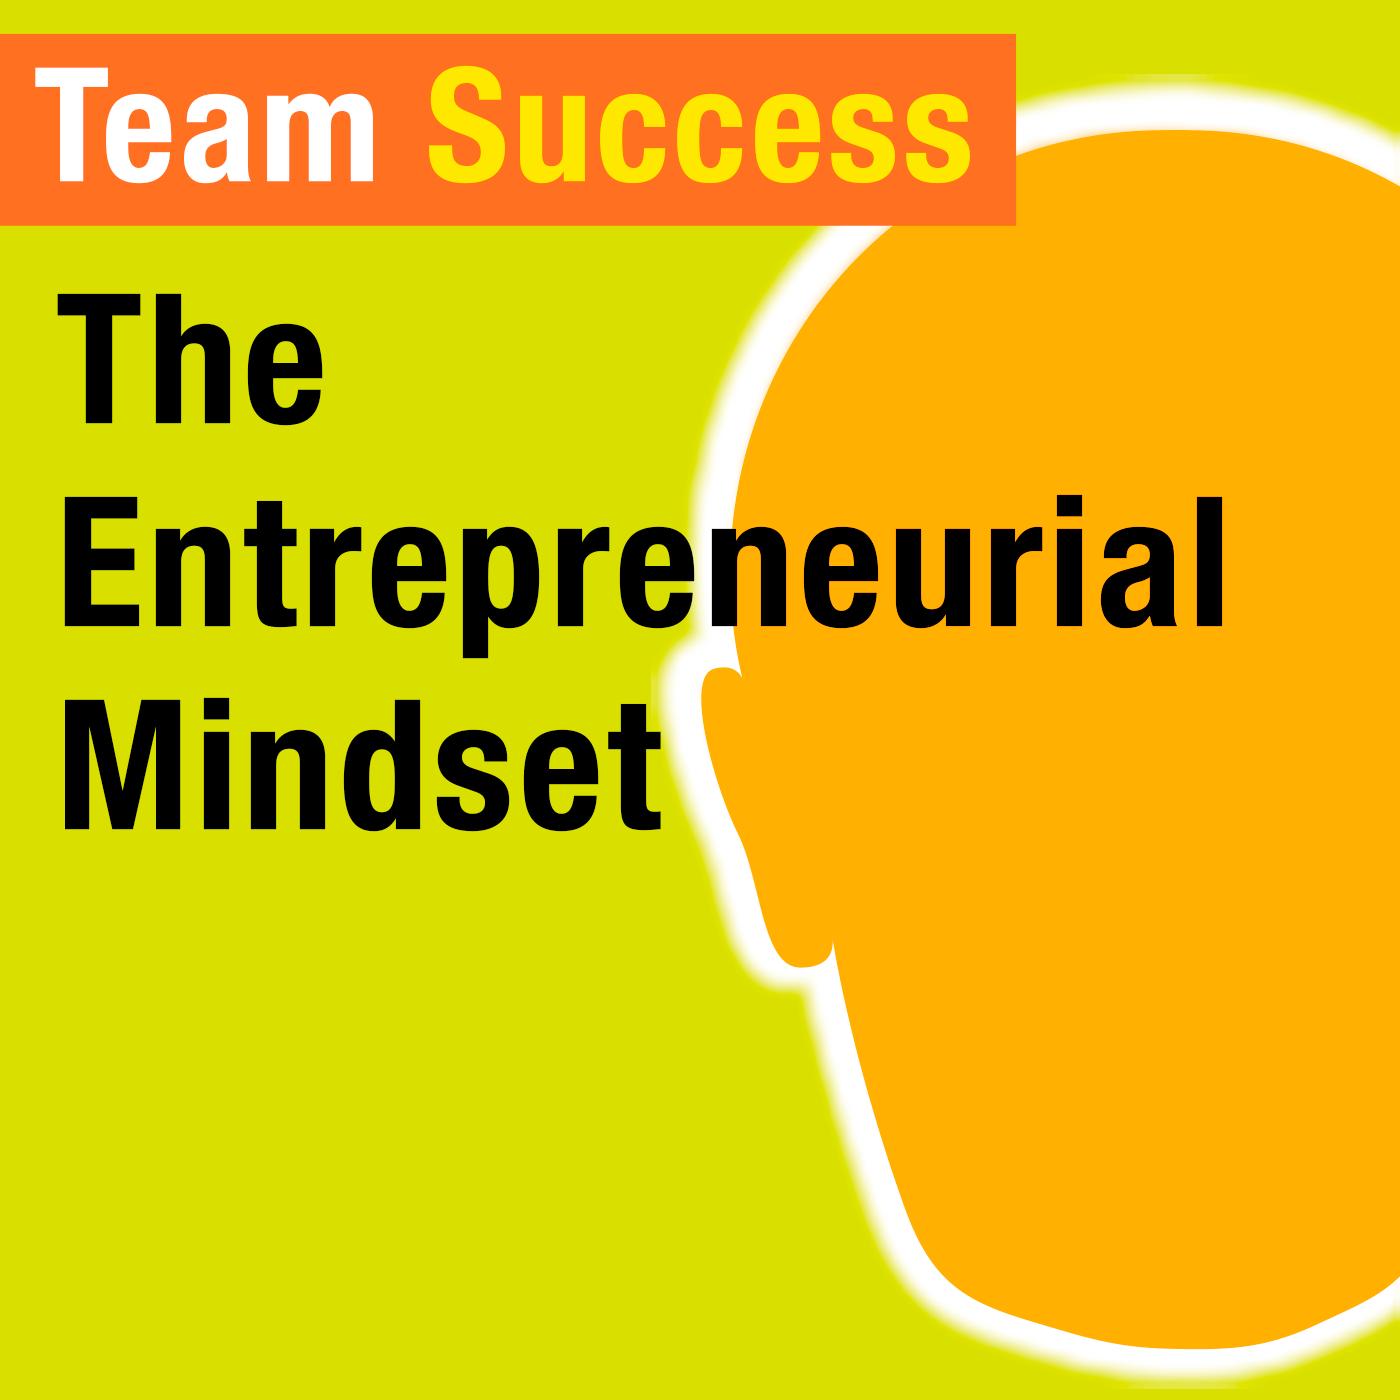 The Entrepreneurial Mindset - Team Success Podcast